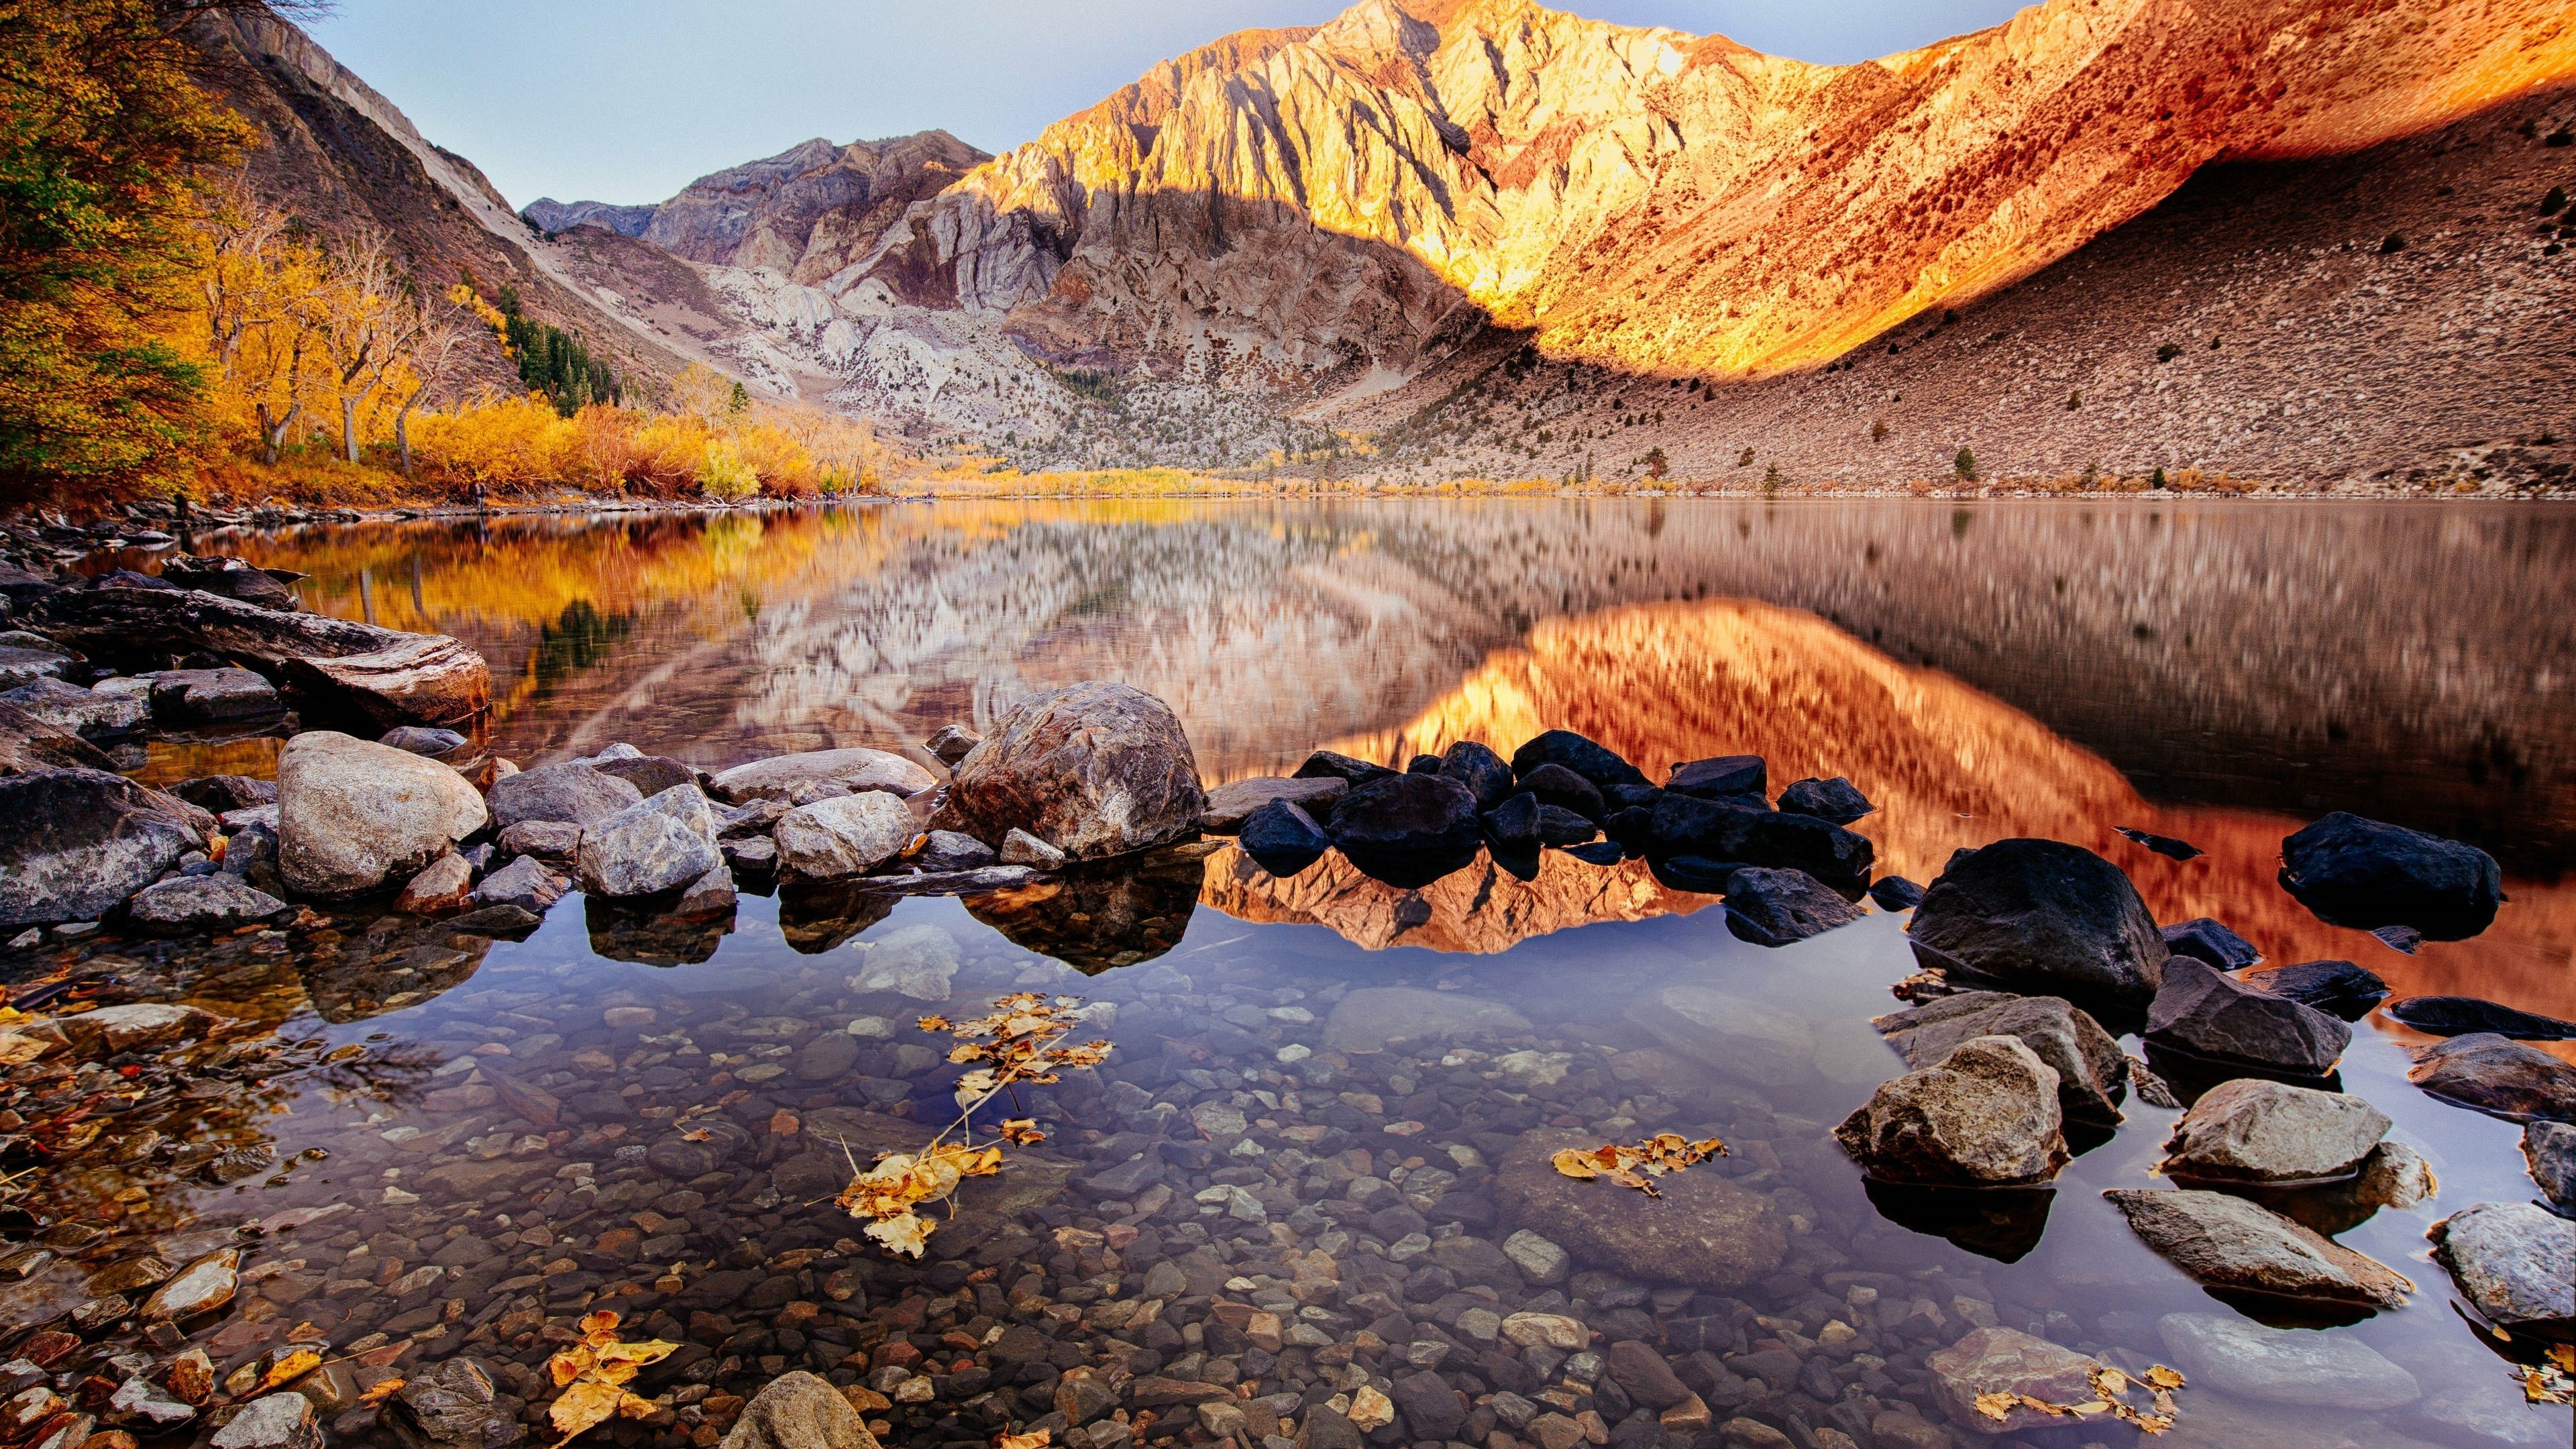 convictlake,autumnmountmorriso,california, USA View